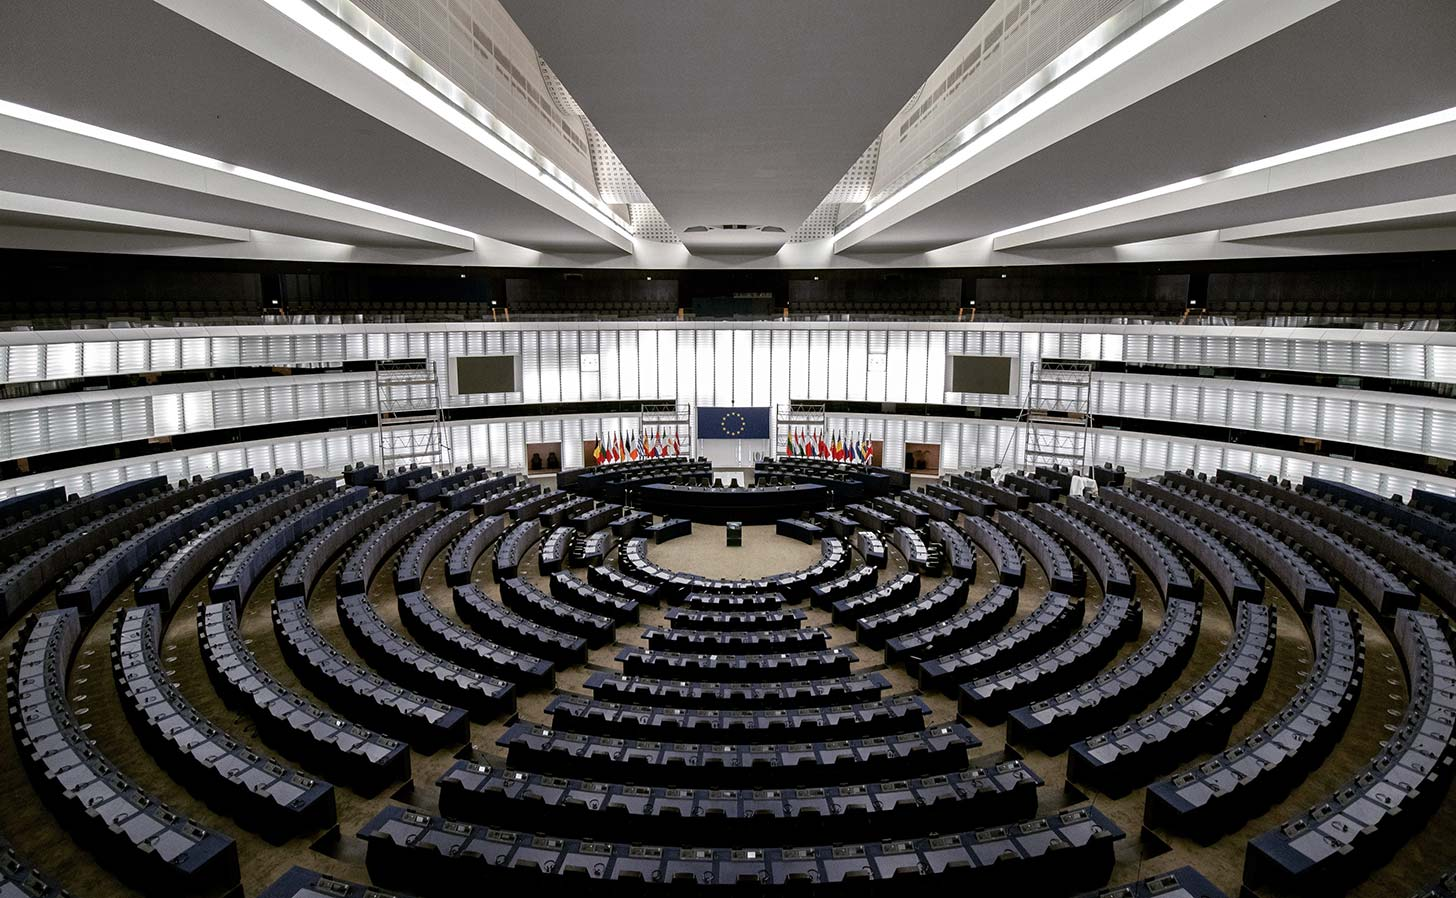 Europaparlamentet i Strasbourg, Frankrike. Foto: Frederic Köberl / Unsplash